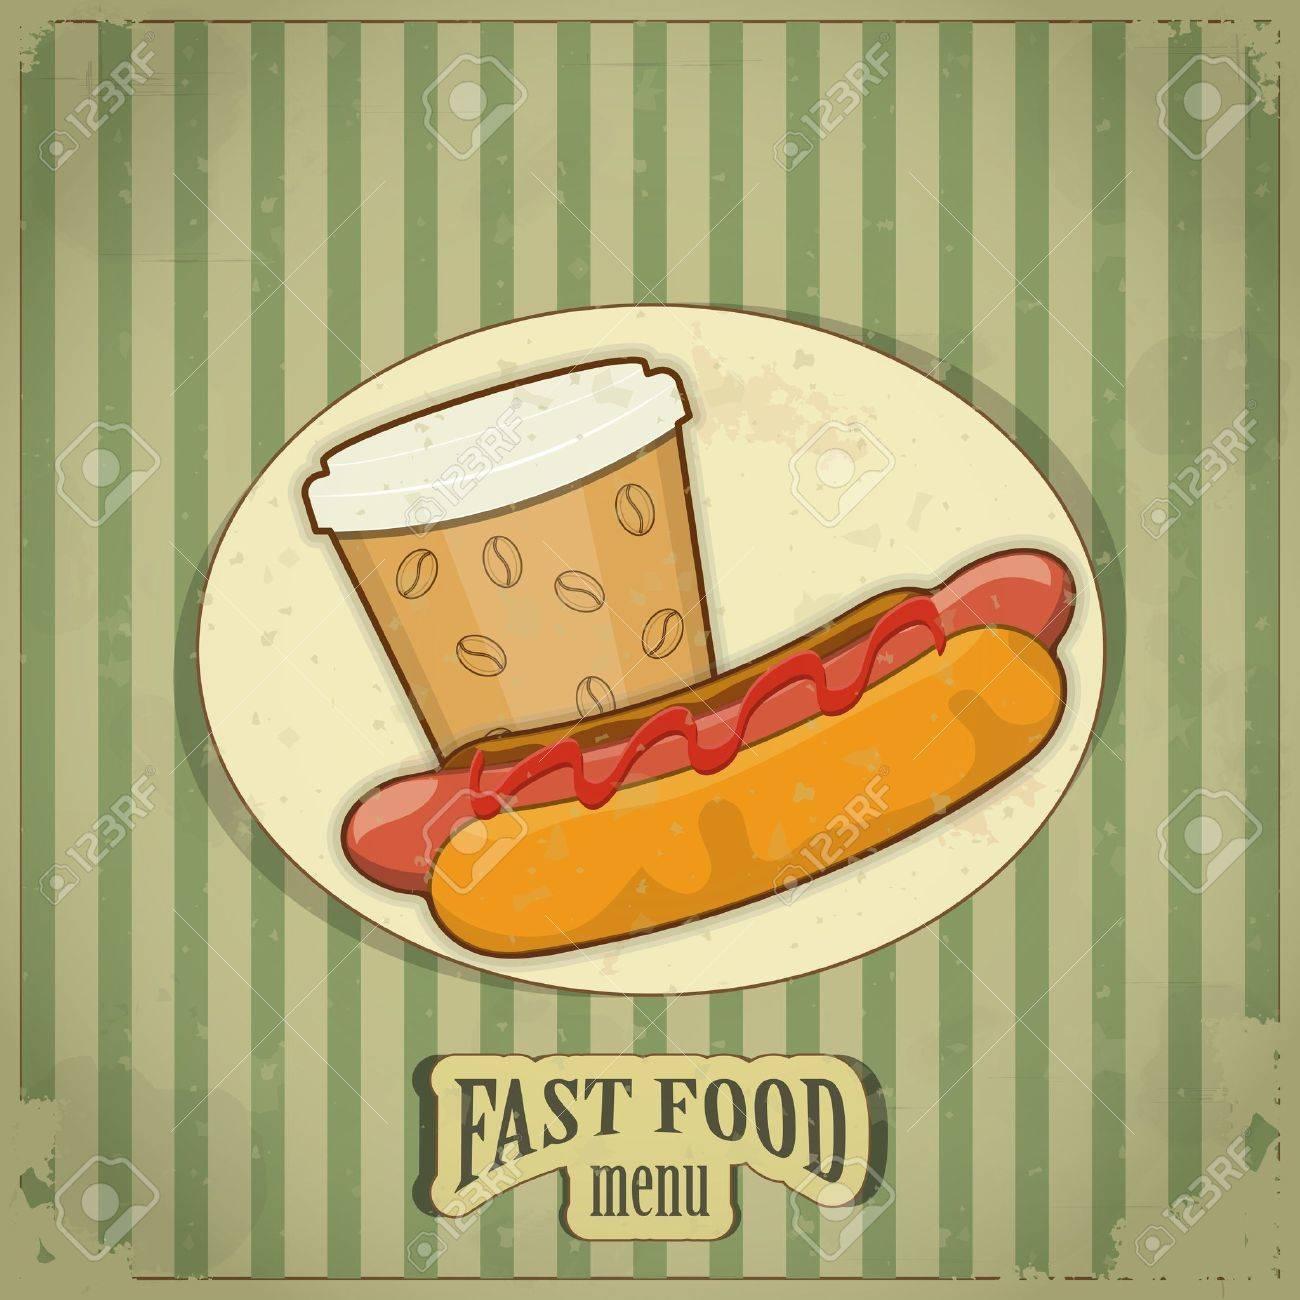 Vintage Fast Food Menu - the food on  grunge background - vector illustration Stock Vector - 12324692